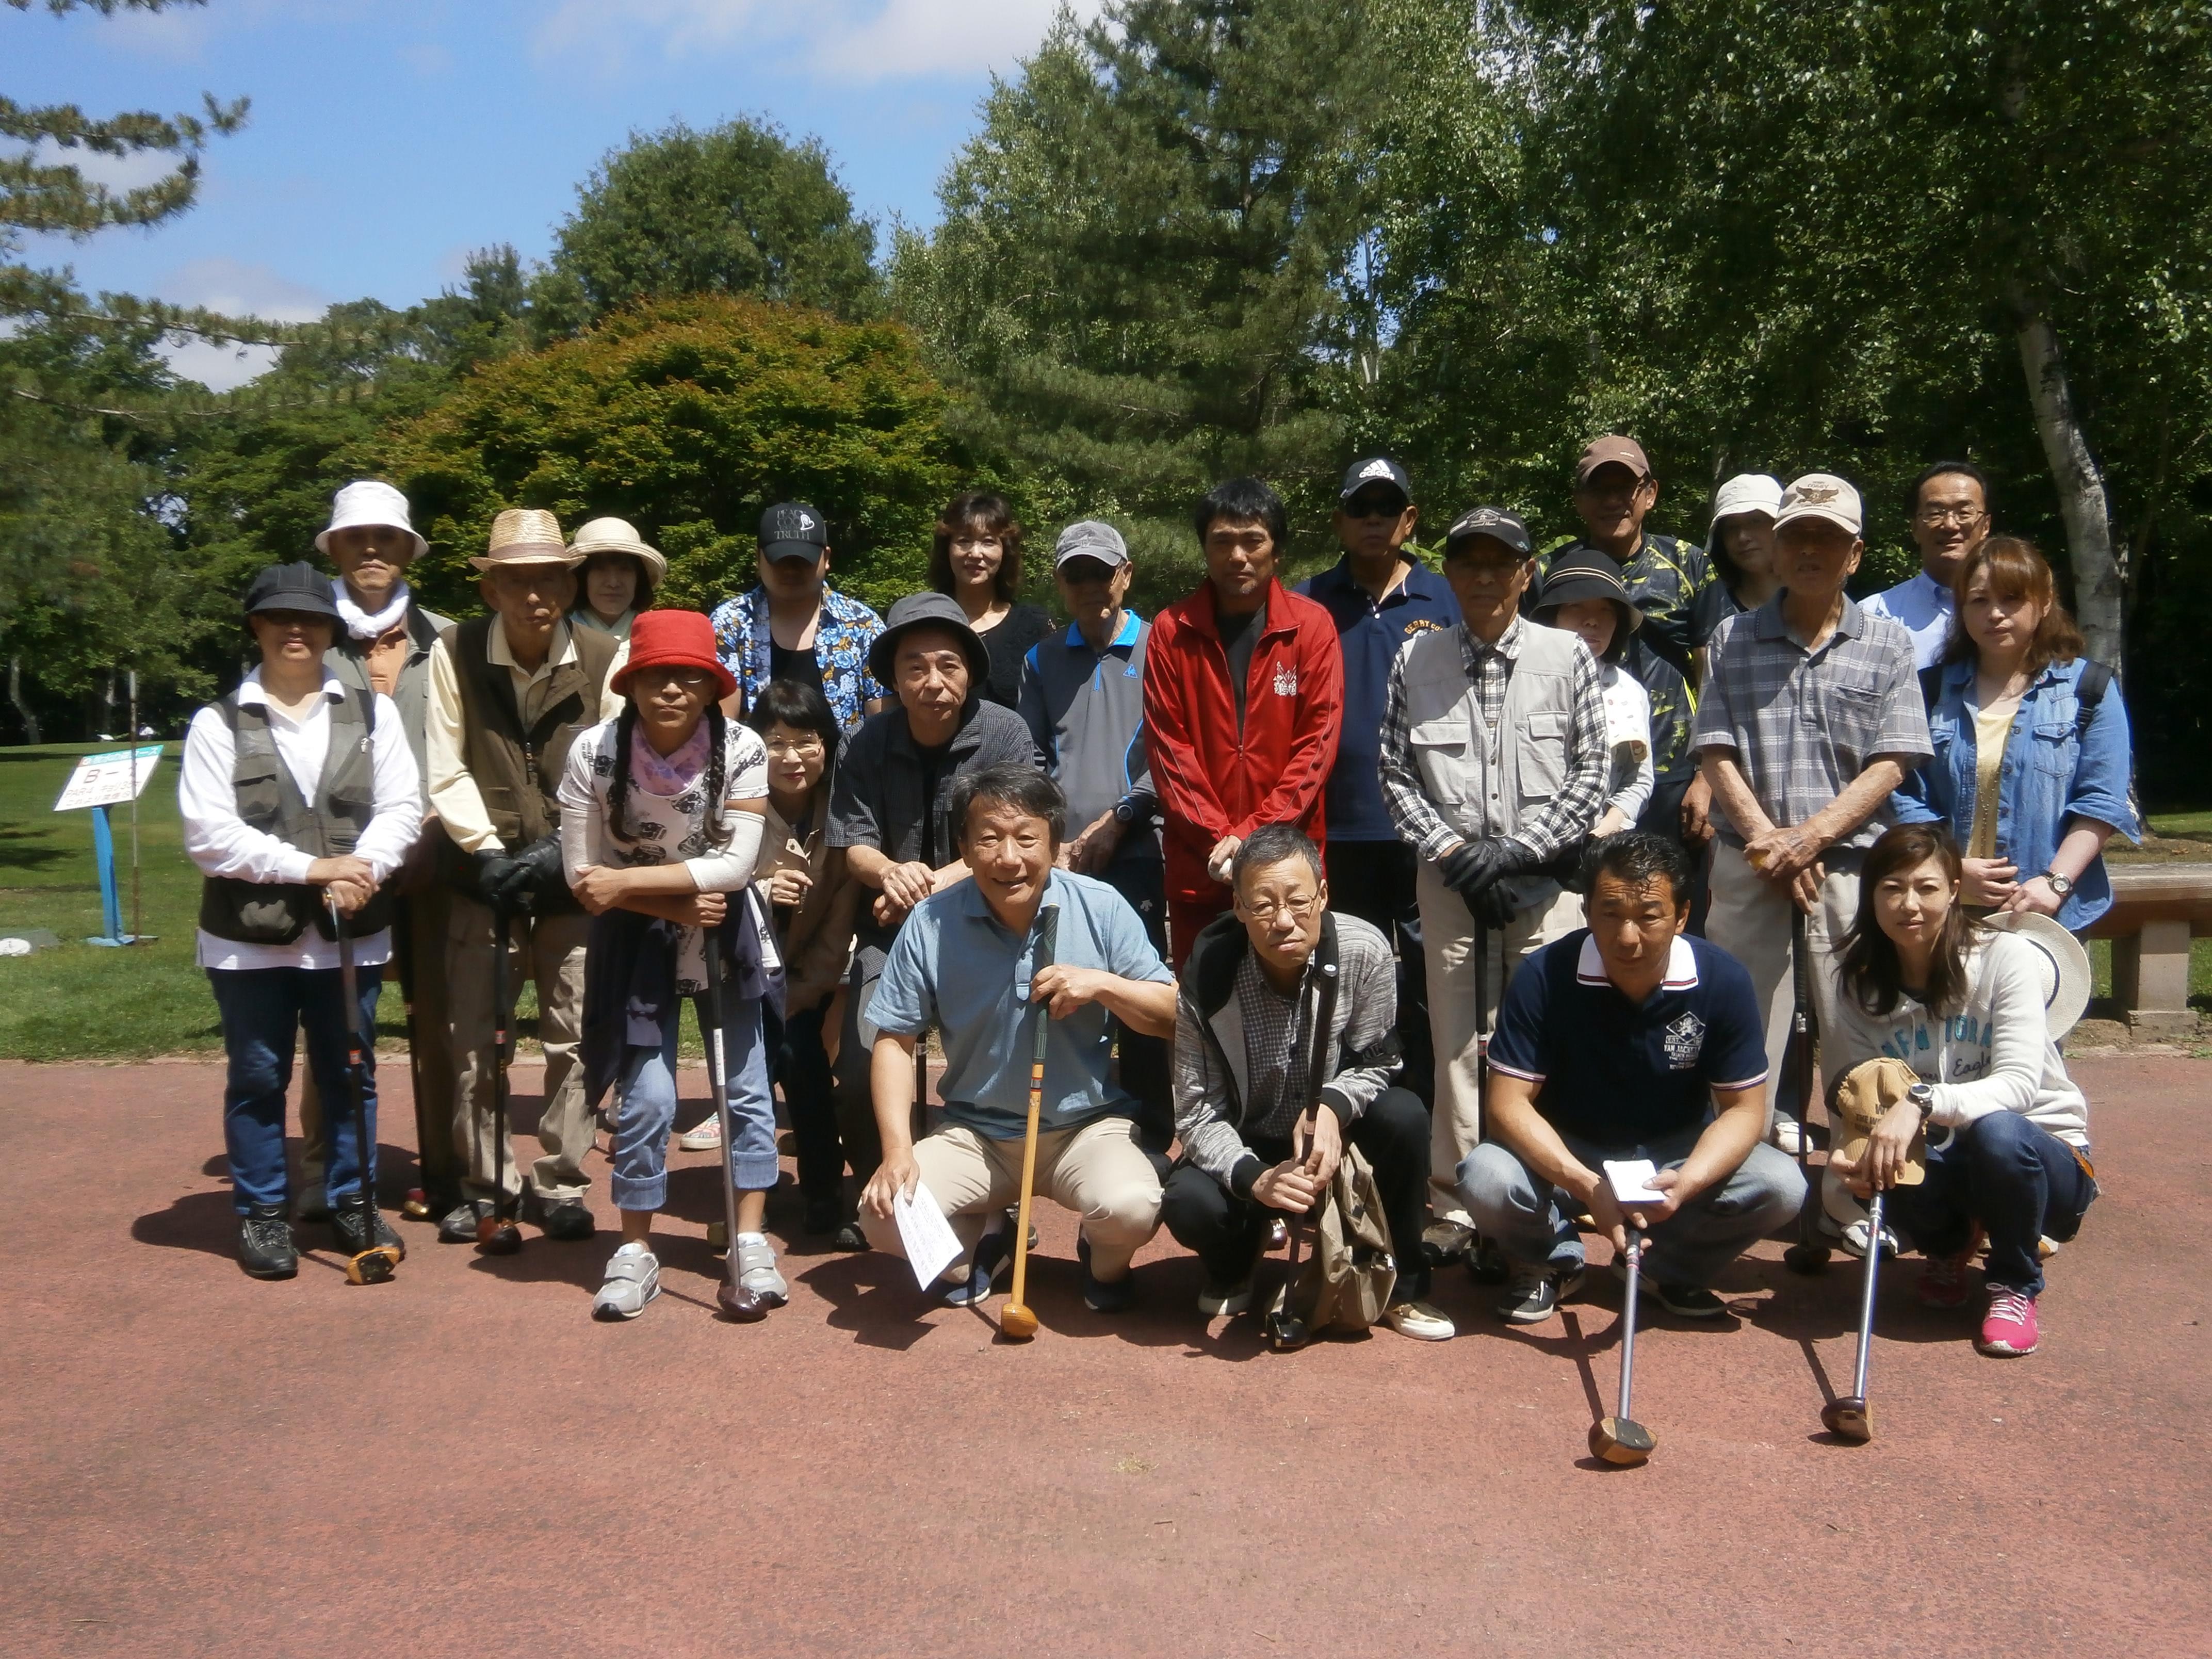 http://www.n2jinhinyouki.com/news/images/P7050002.JPG